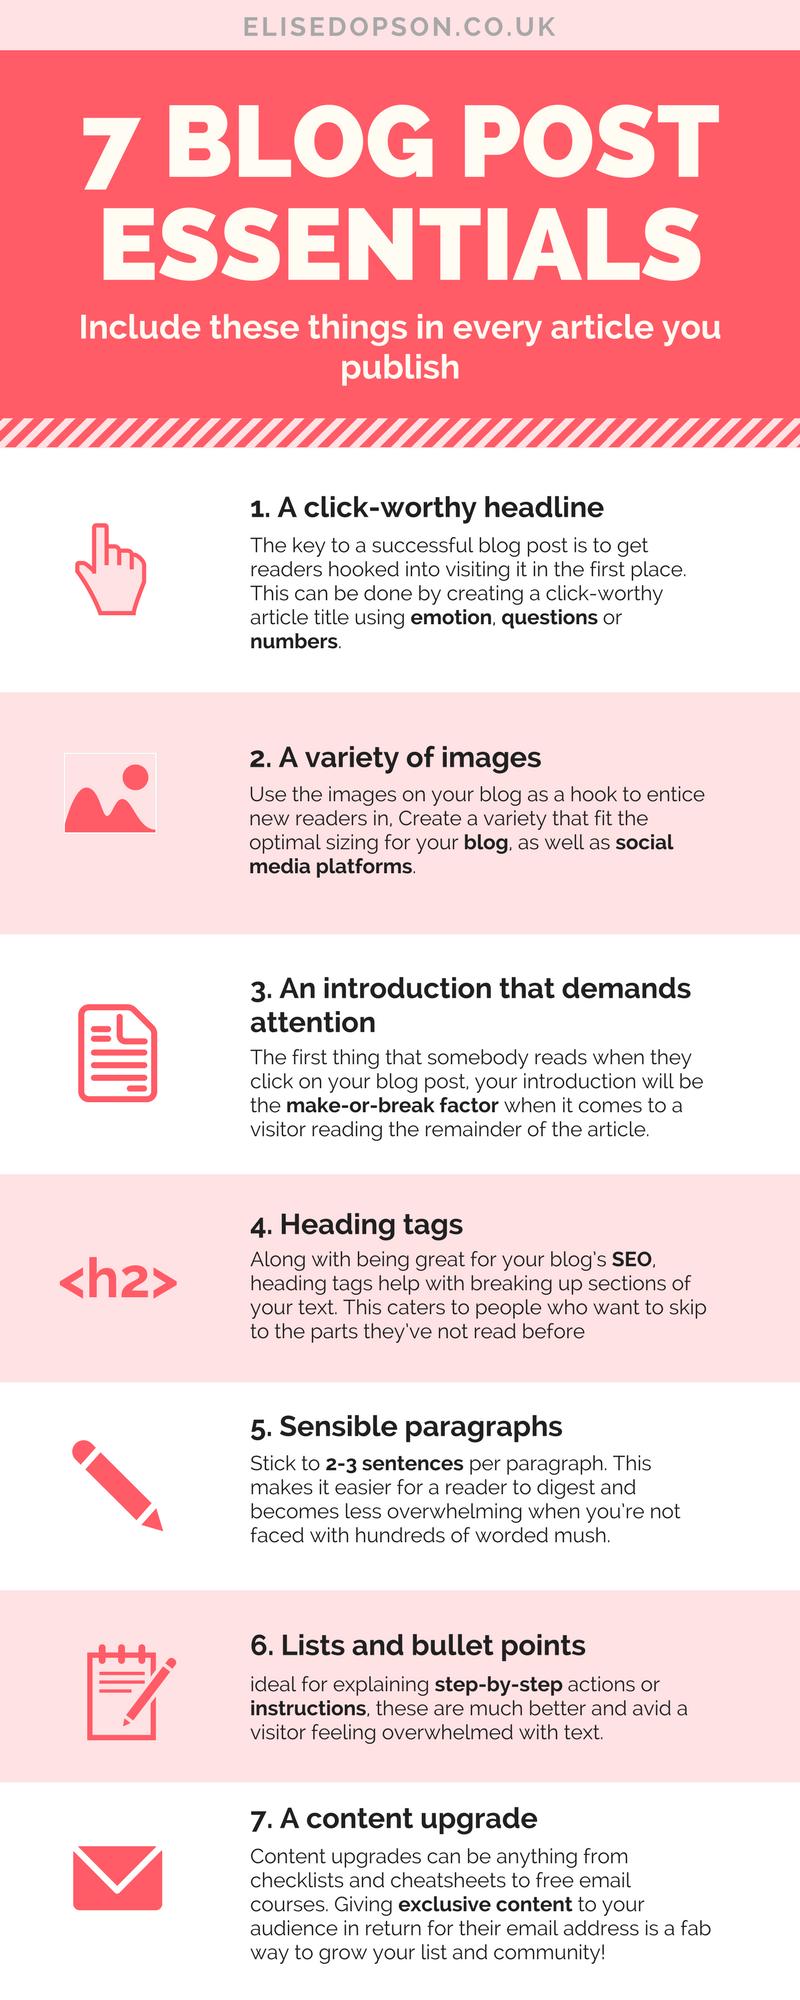 blog post essentials infographic